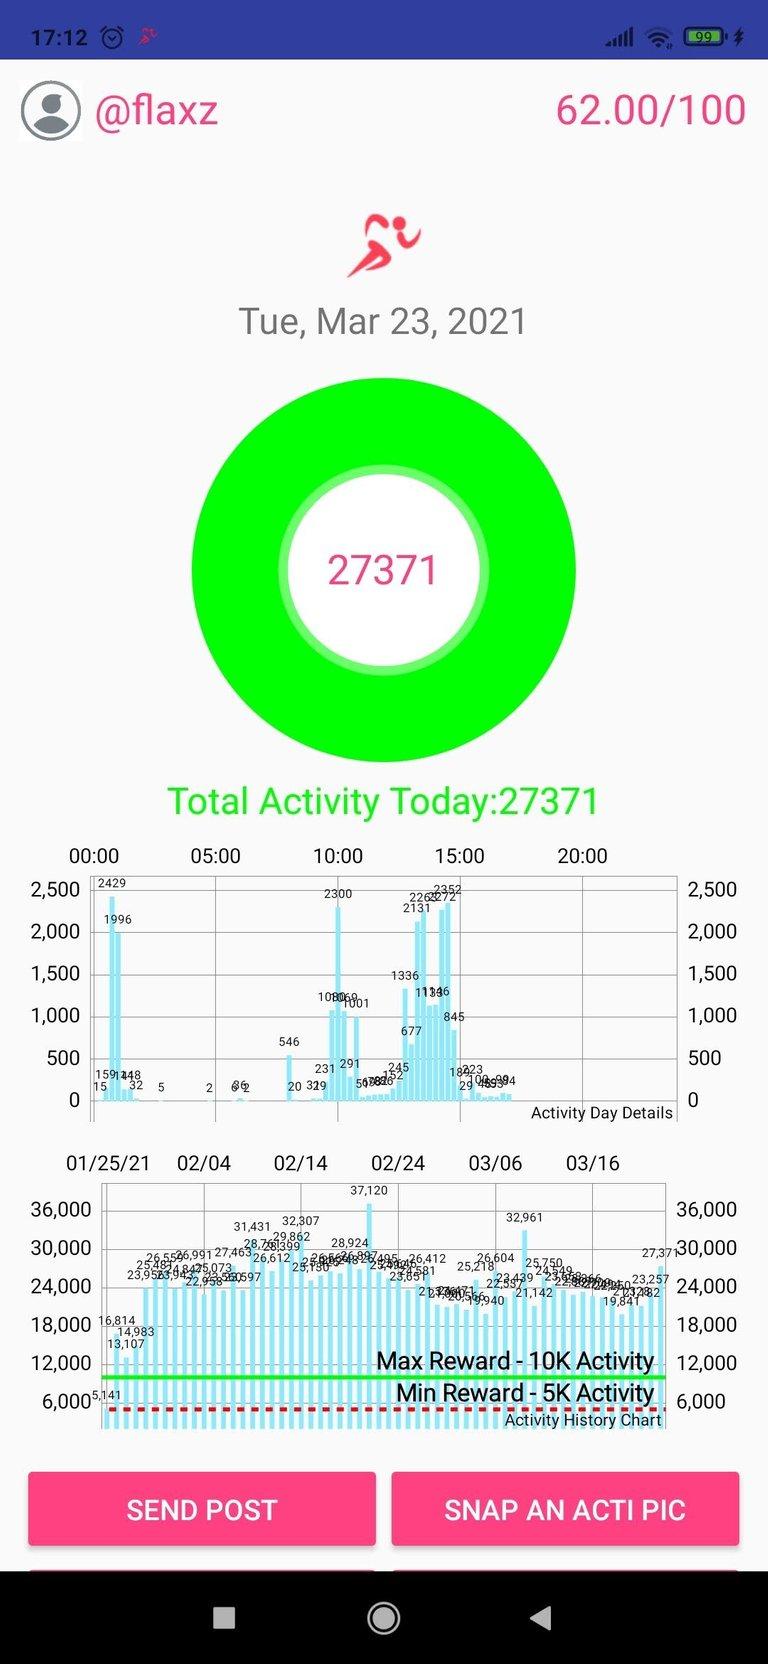 Screenshot_2021-03-23-17-12-50-467_io.actifit.fitnesstracker.actifitfitnesstracker.jpg